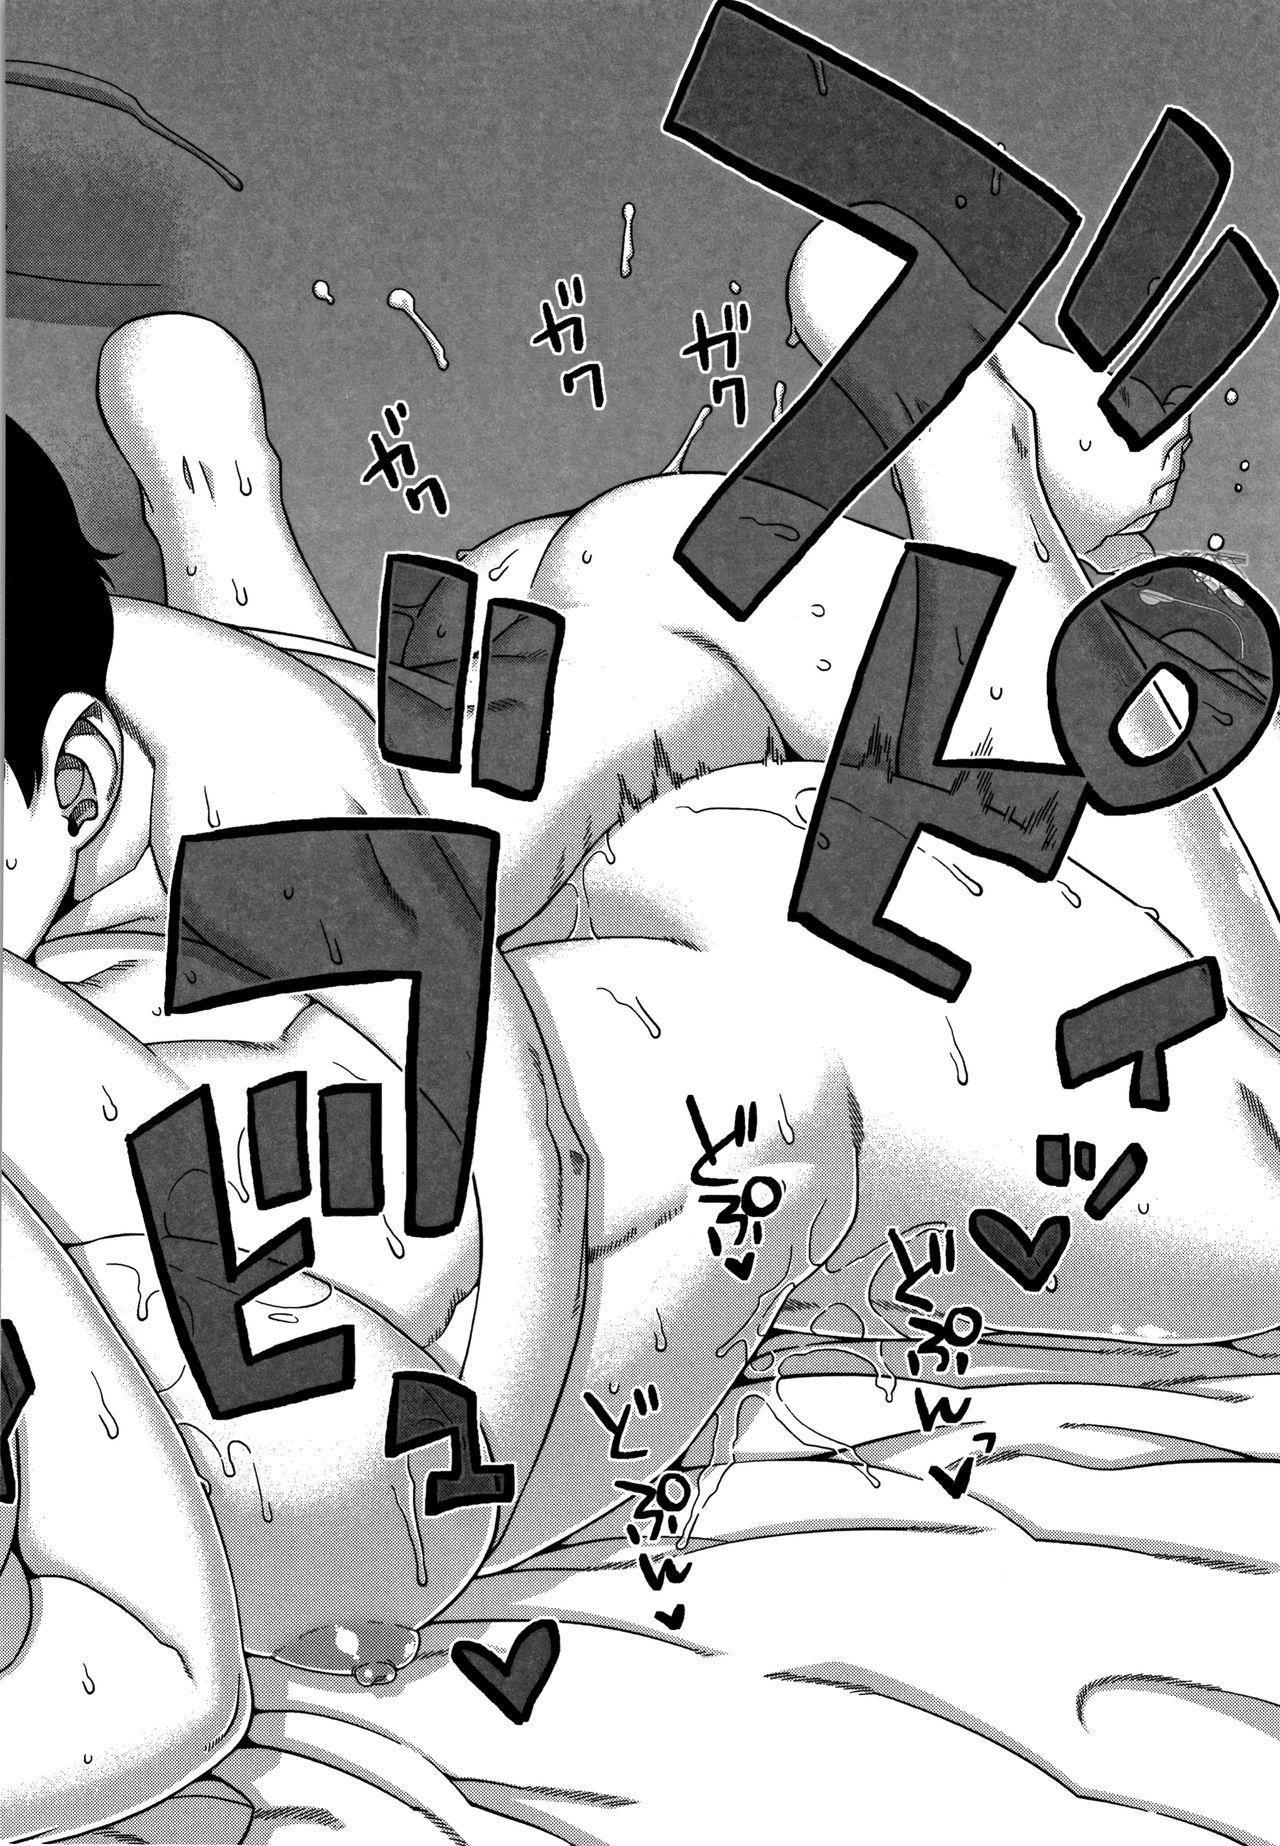 [Takatsu] Kami-sama no Iu Toori   As God Says Ch. 1-2 [English] [Secluded] 28